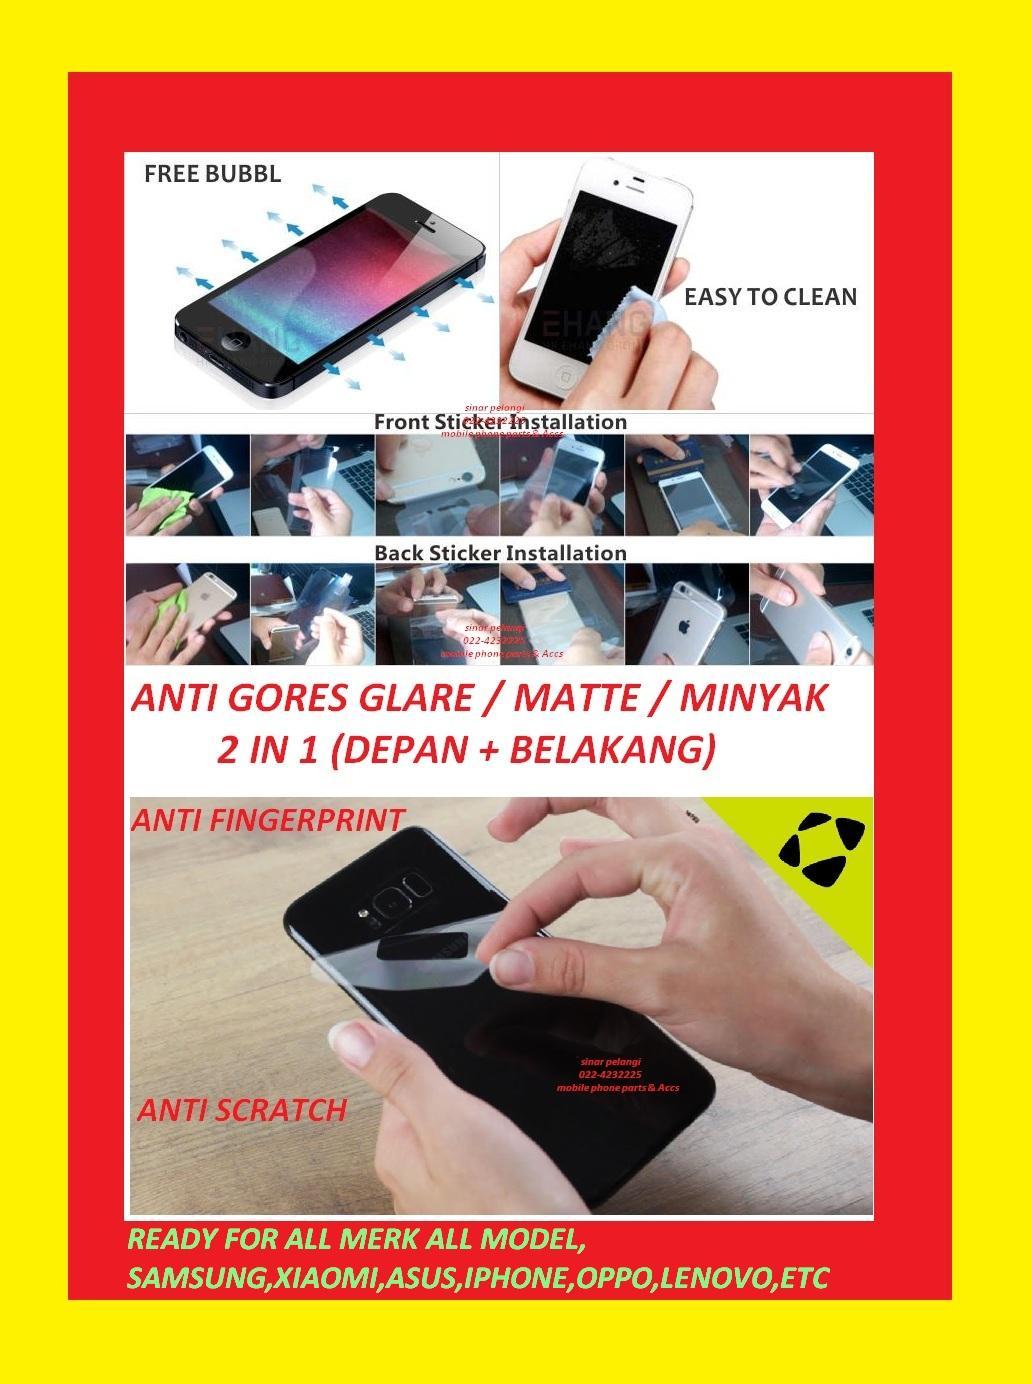 Fitur Samsung S7 Edge G935 Depan Belakang 2 In 1 Anti Gores Glare Shock Screen Protector Full Depanbelakang Minyak Matte Mate